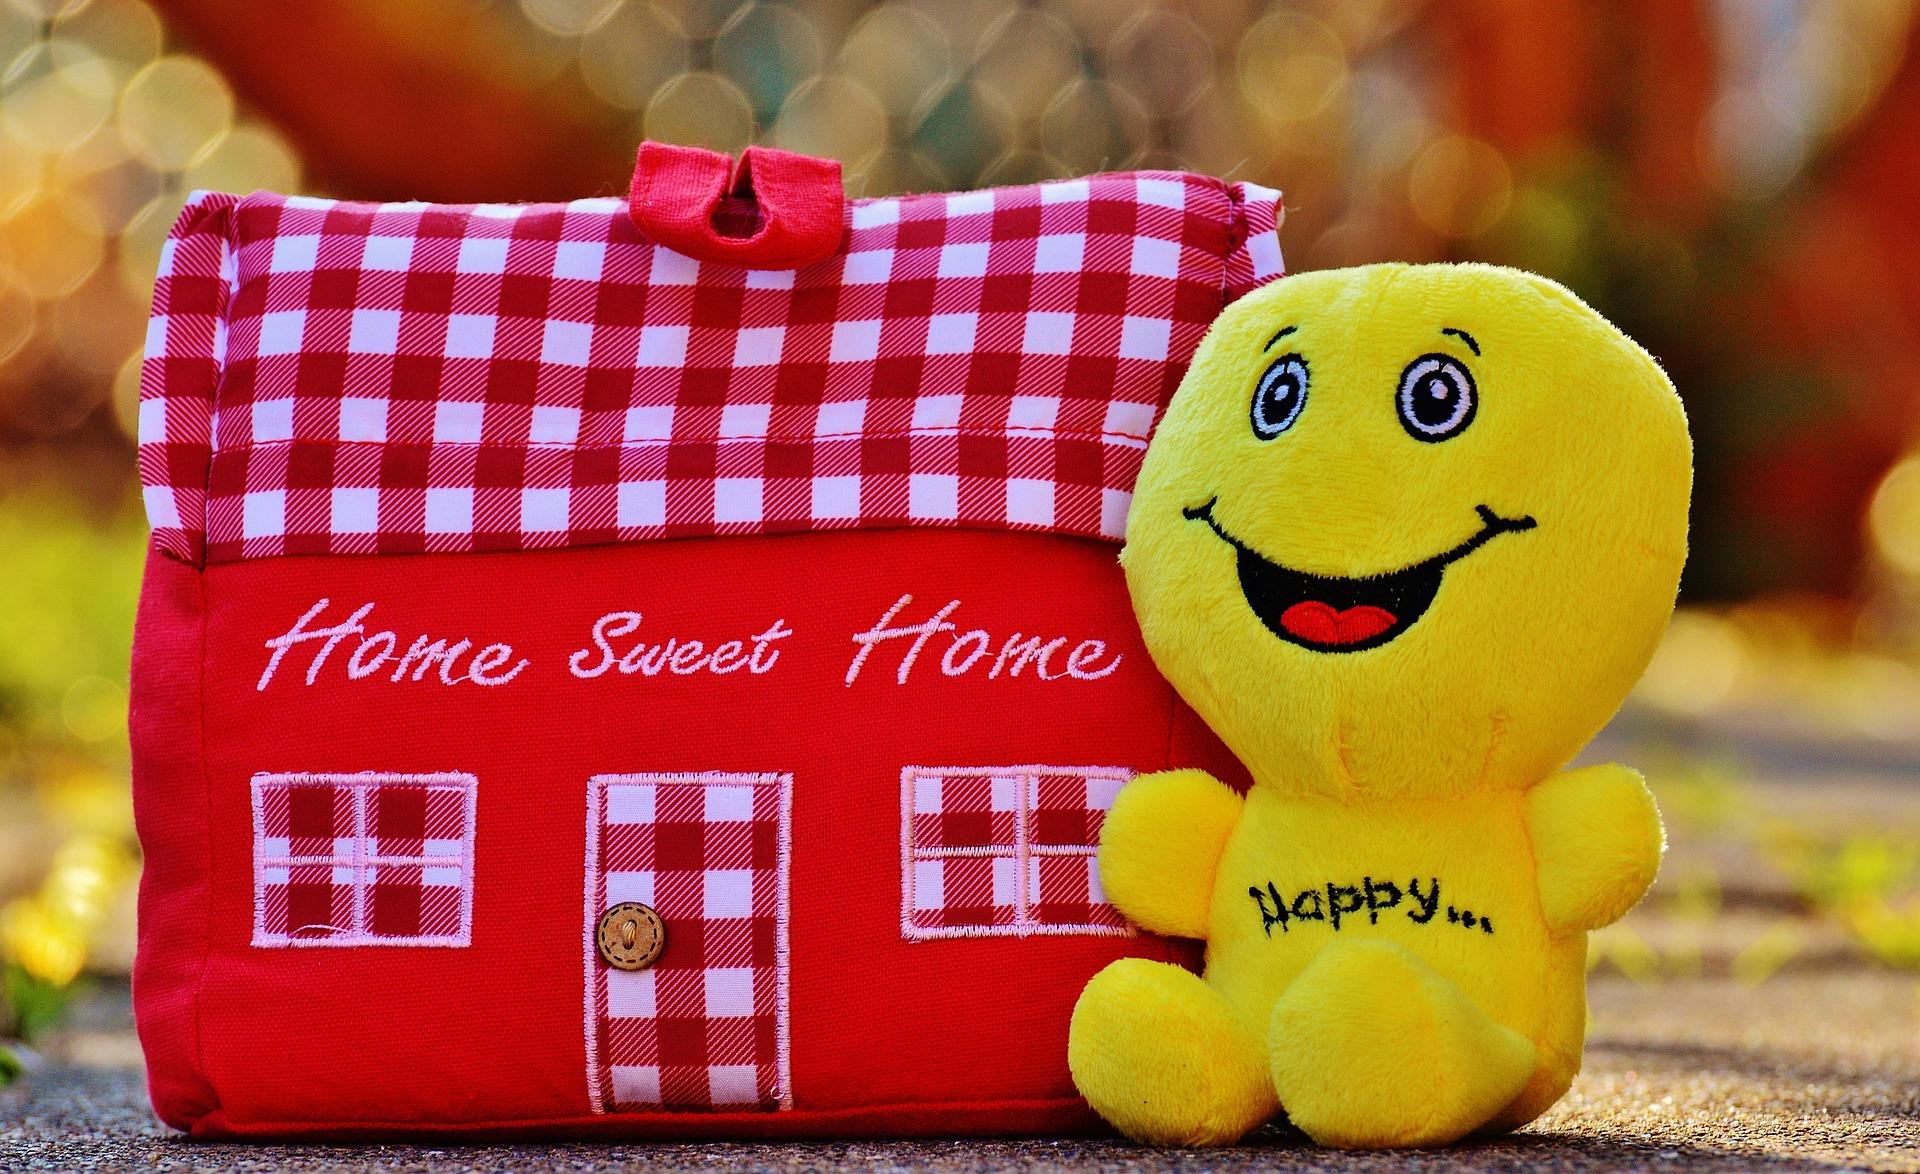 Happy House Share